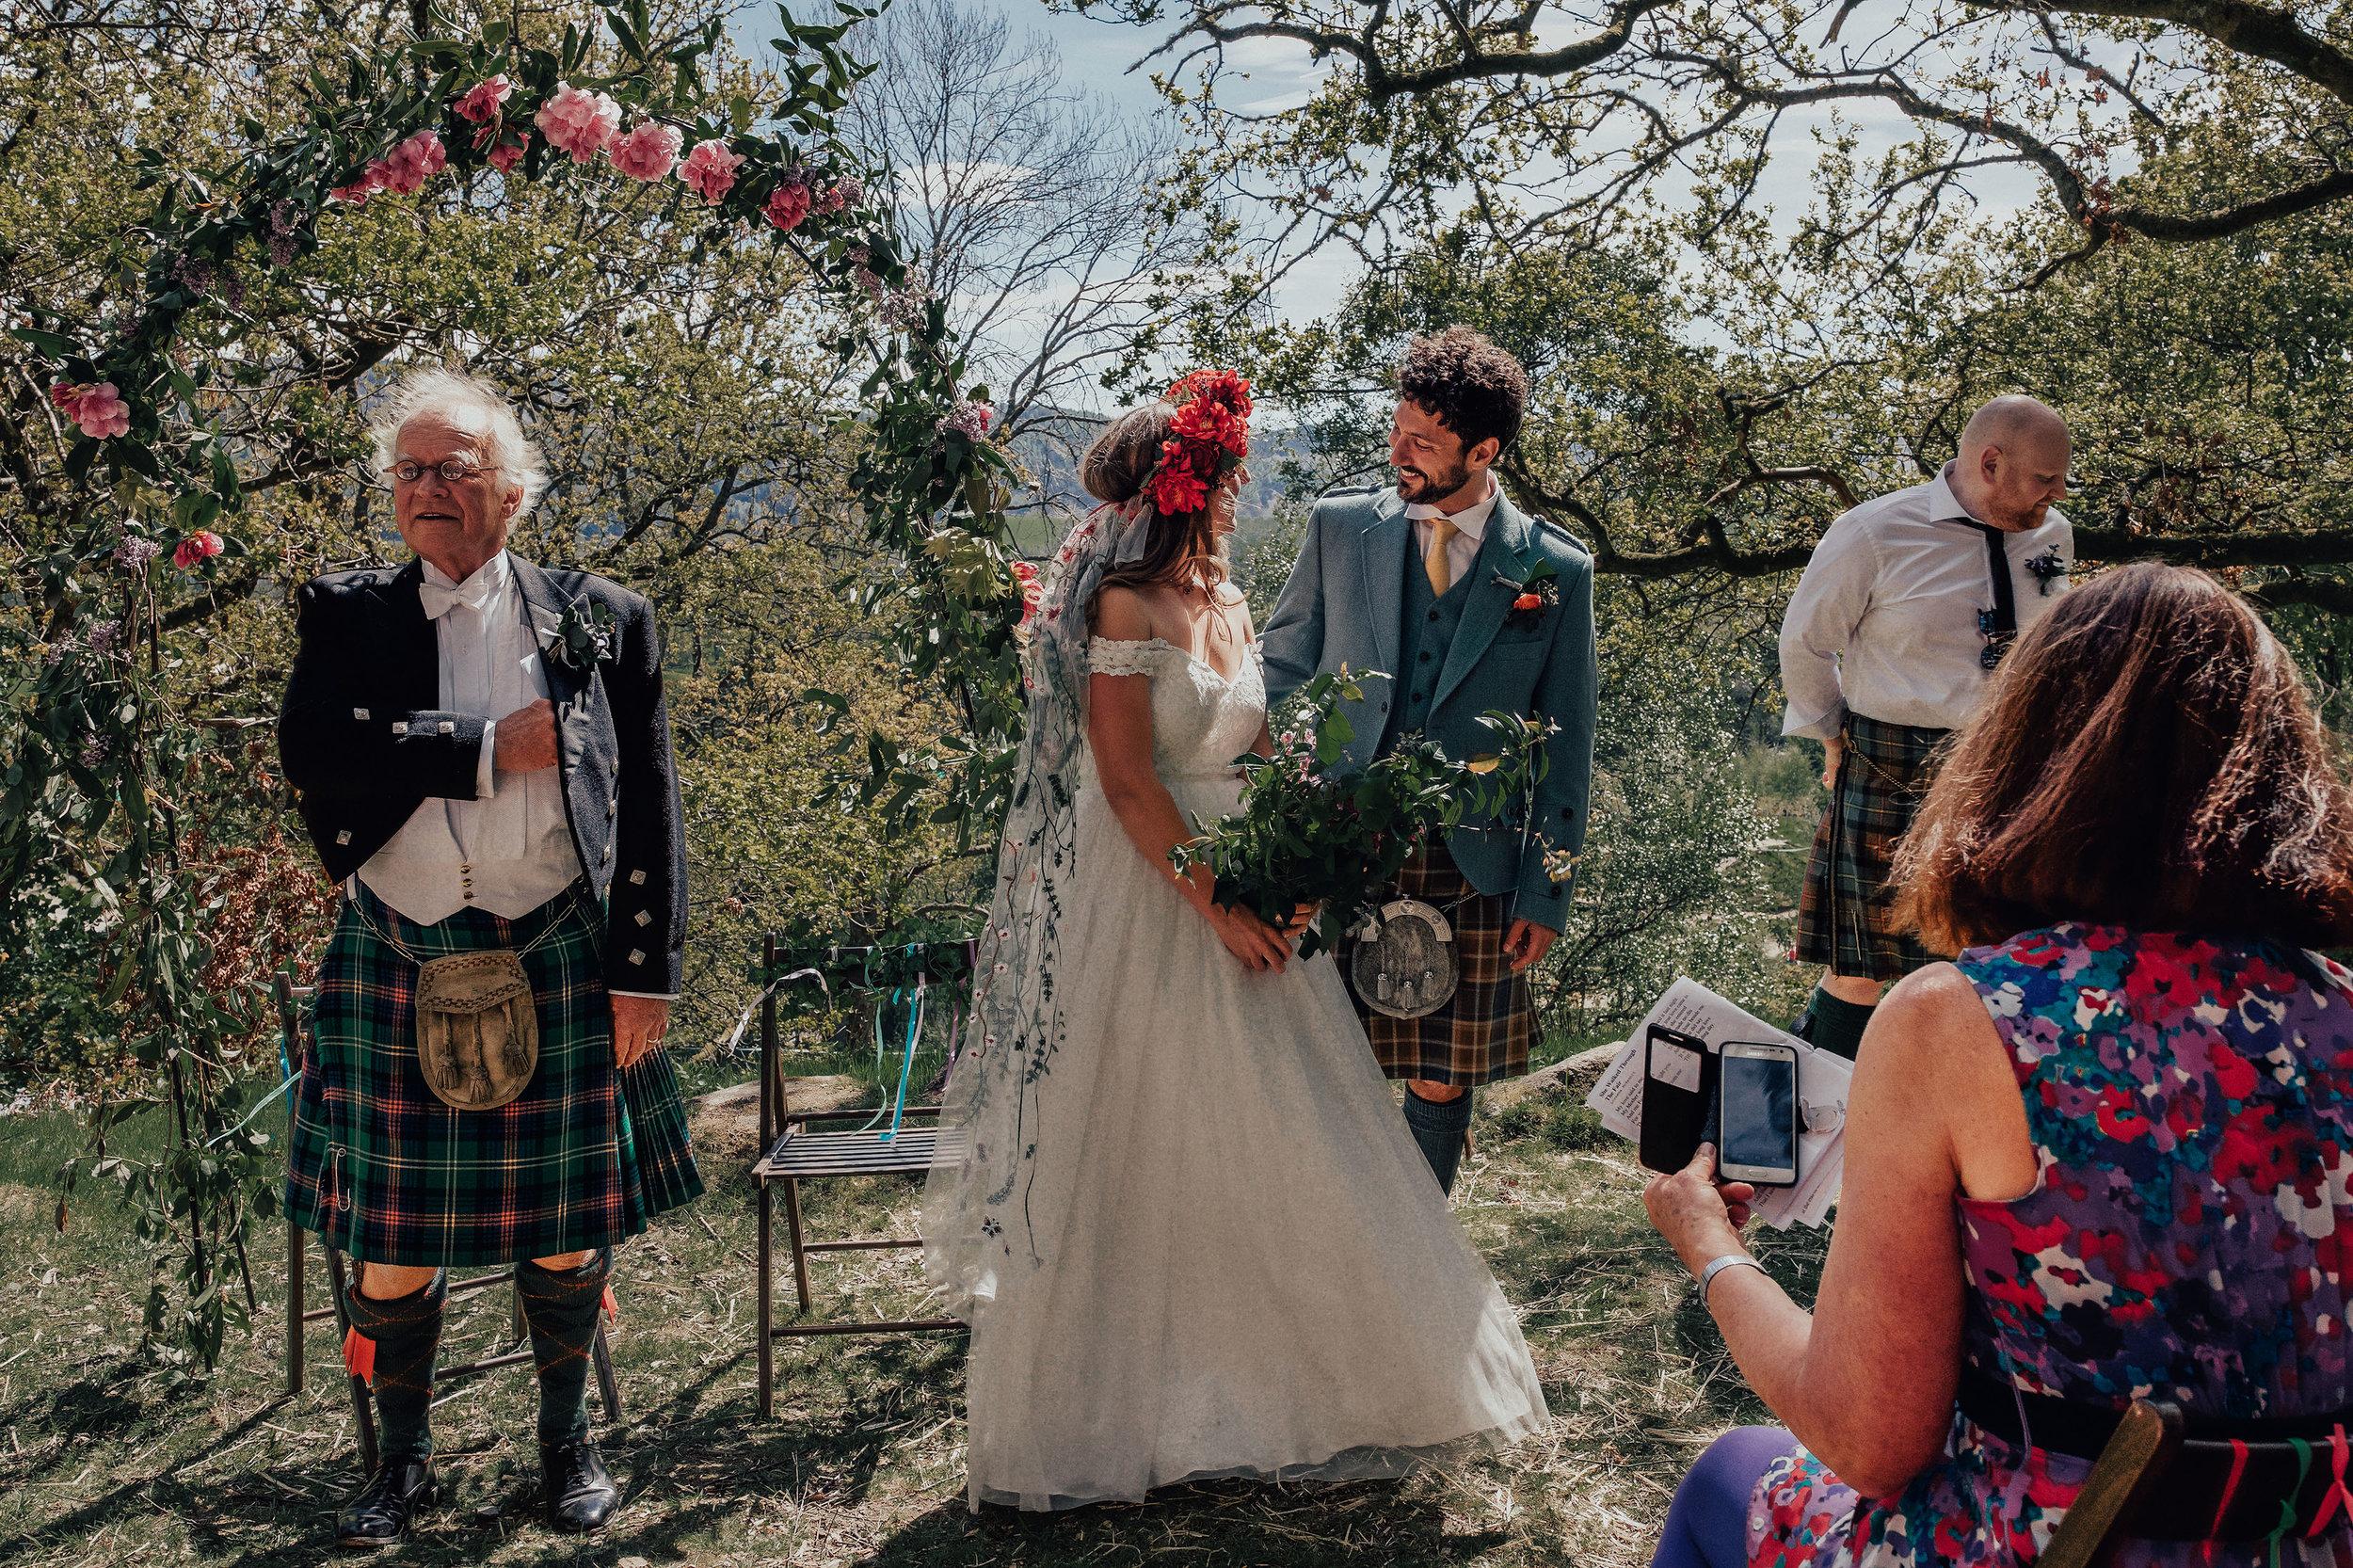 COMRIE_CROFT_WEDDINGS_PJ_PHILLIPS_PHOTOGRAPHY_58.jpg